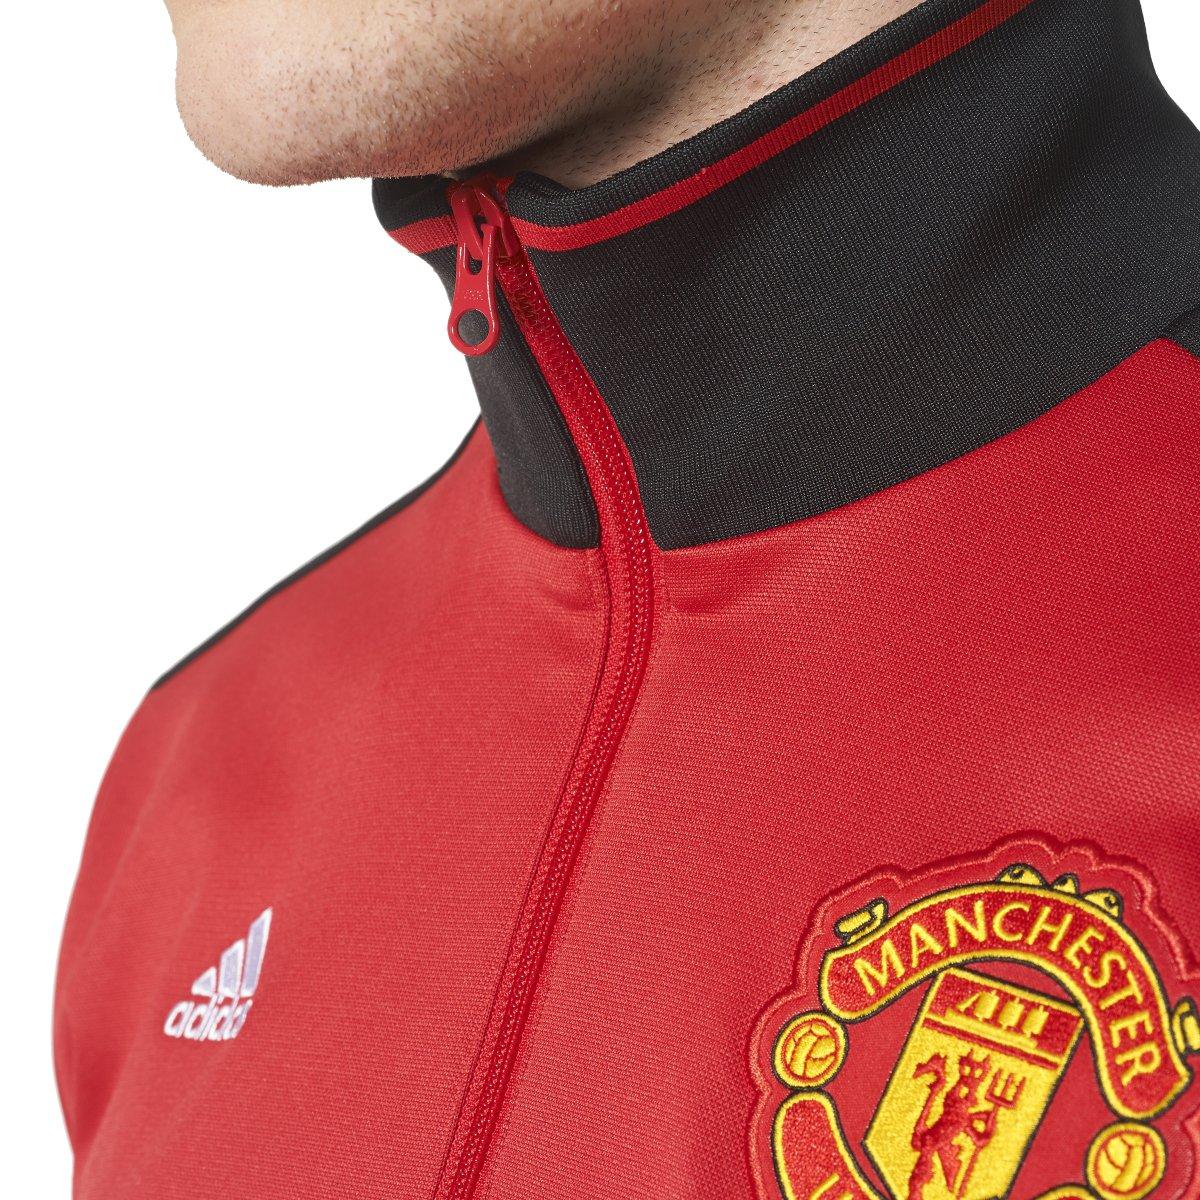 89a897efeb427 Amazon.com: adidas Men's Manchester United 3-Stripes Track Jacket (X ...